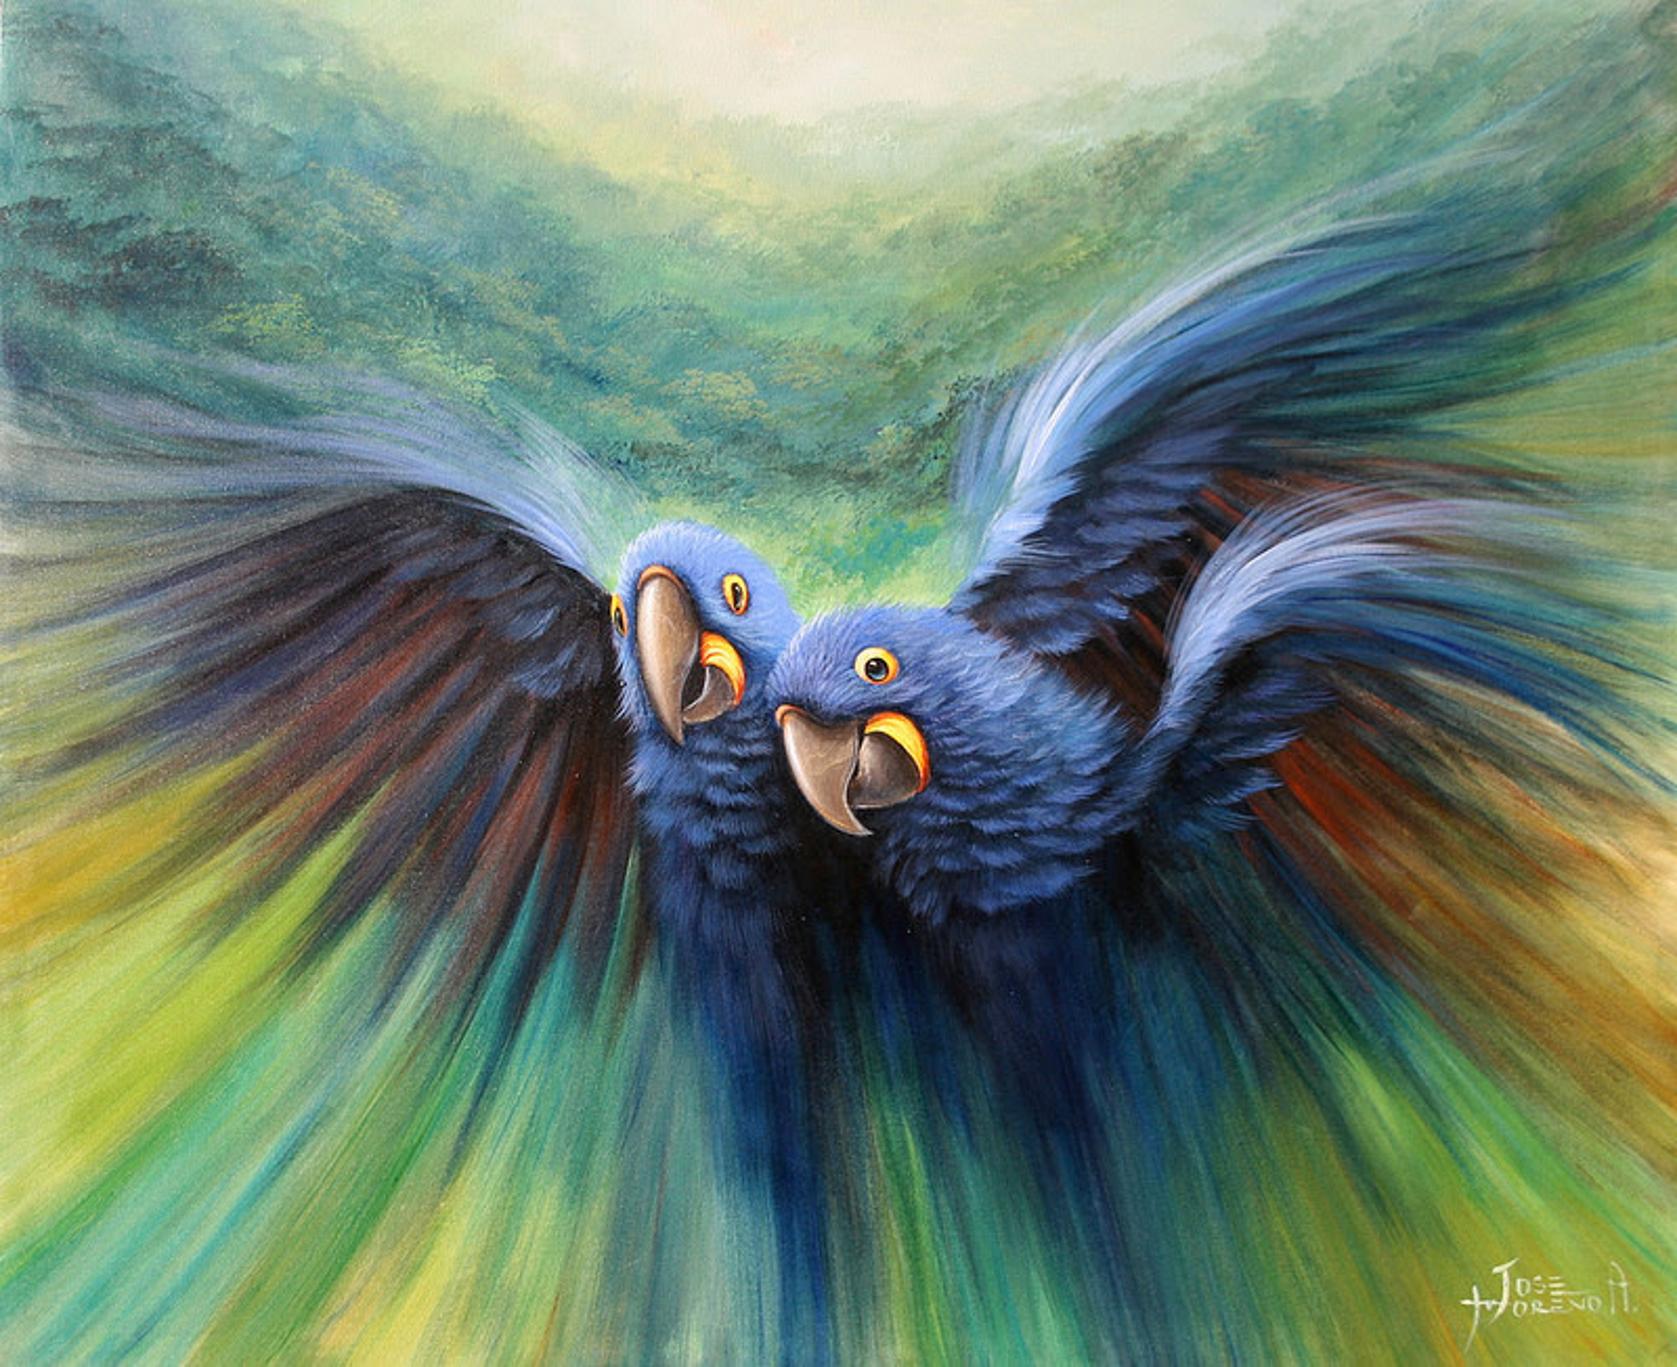 Los Amantes 117 X 110 Cm Oleo Sobre Lienzo Josemorenoaparicio Arte Art Morenoaparicio Oleo Oil Art Pintura De Pajaros Pinturas De Aves Cruces Pintadas